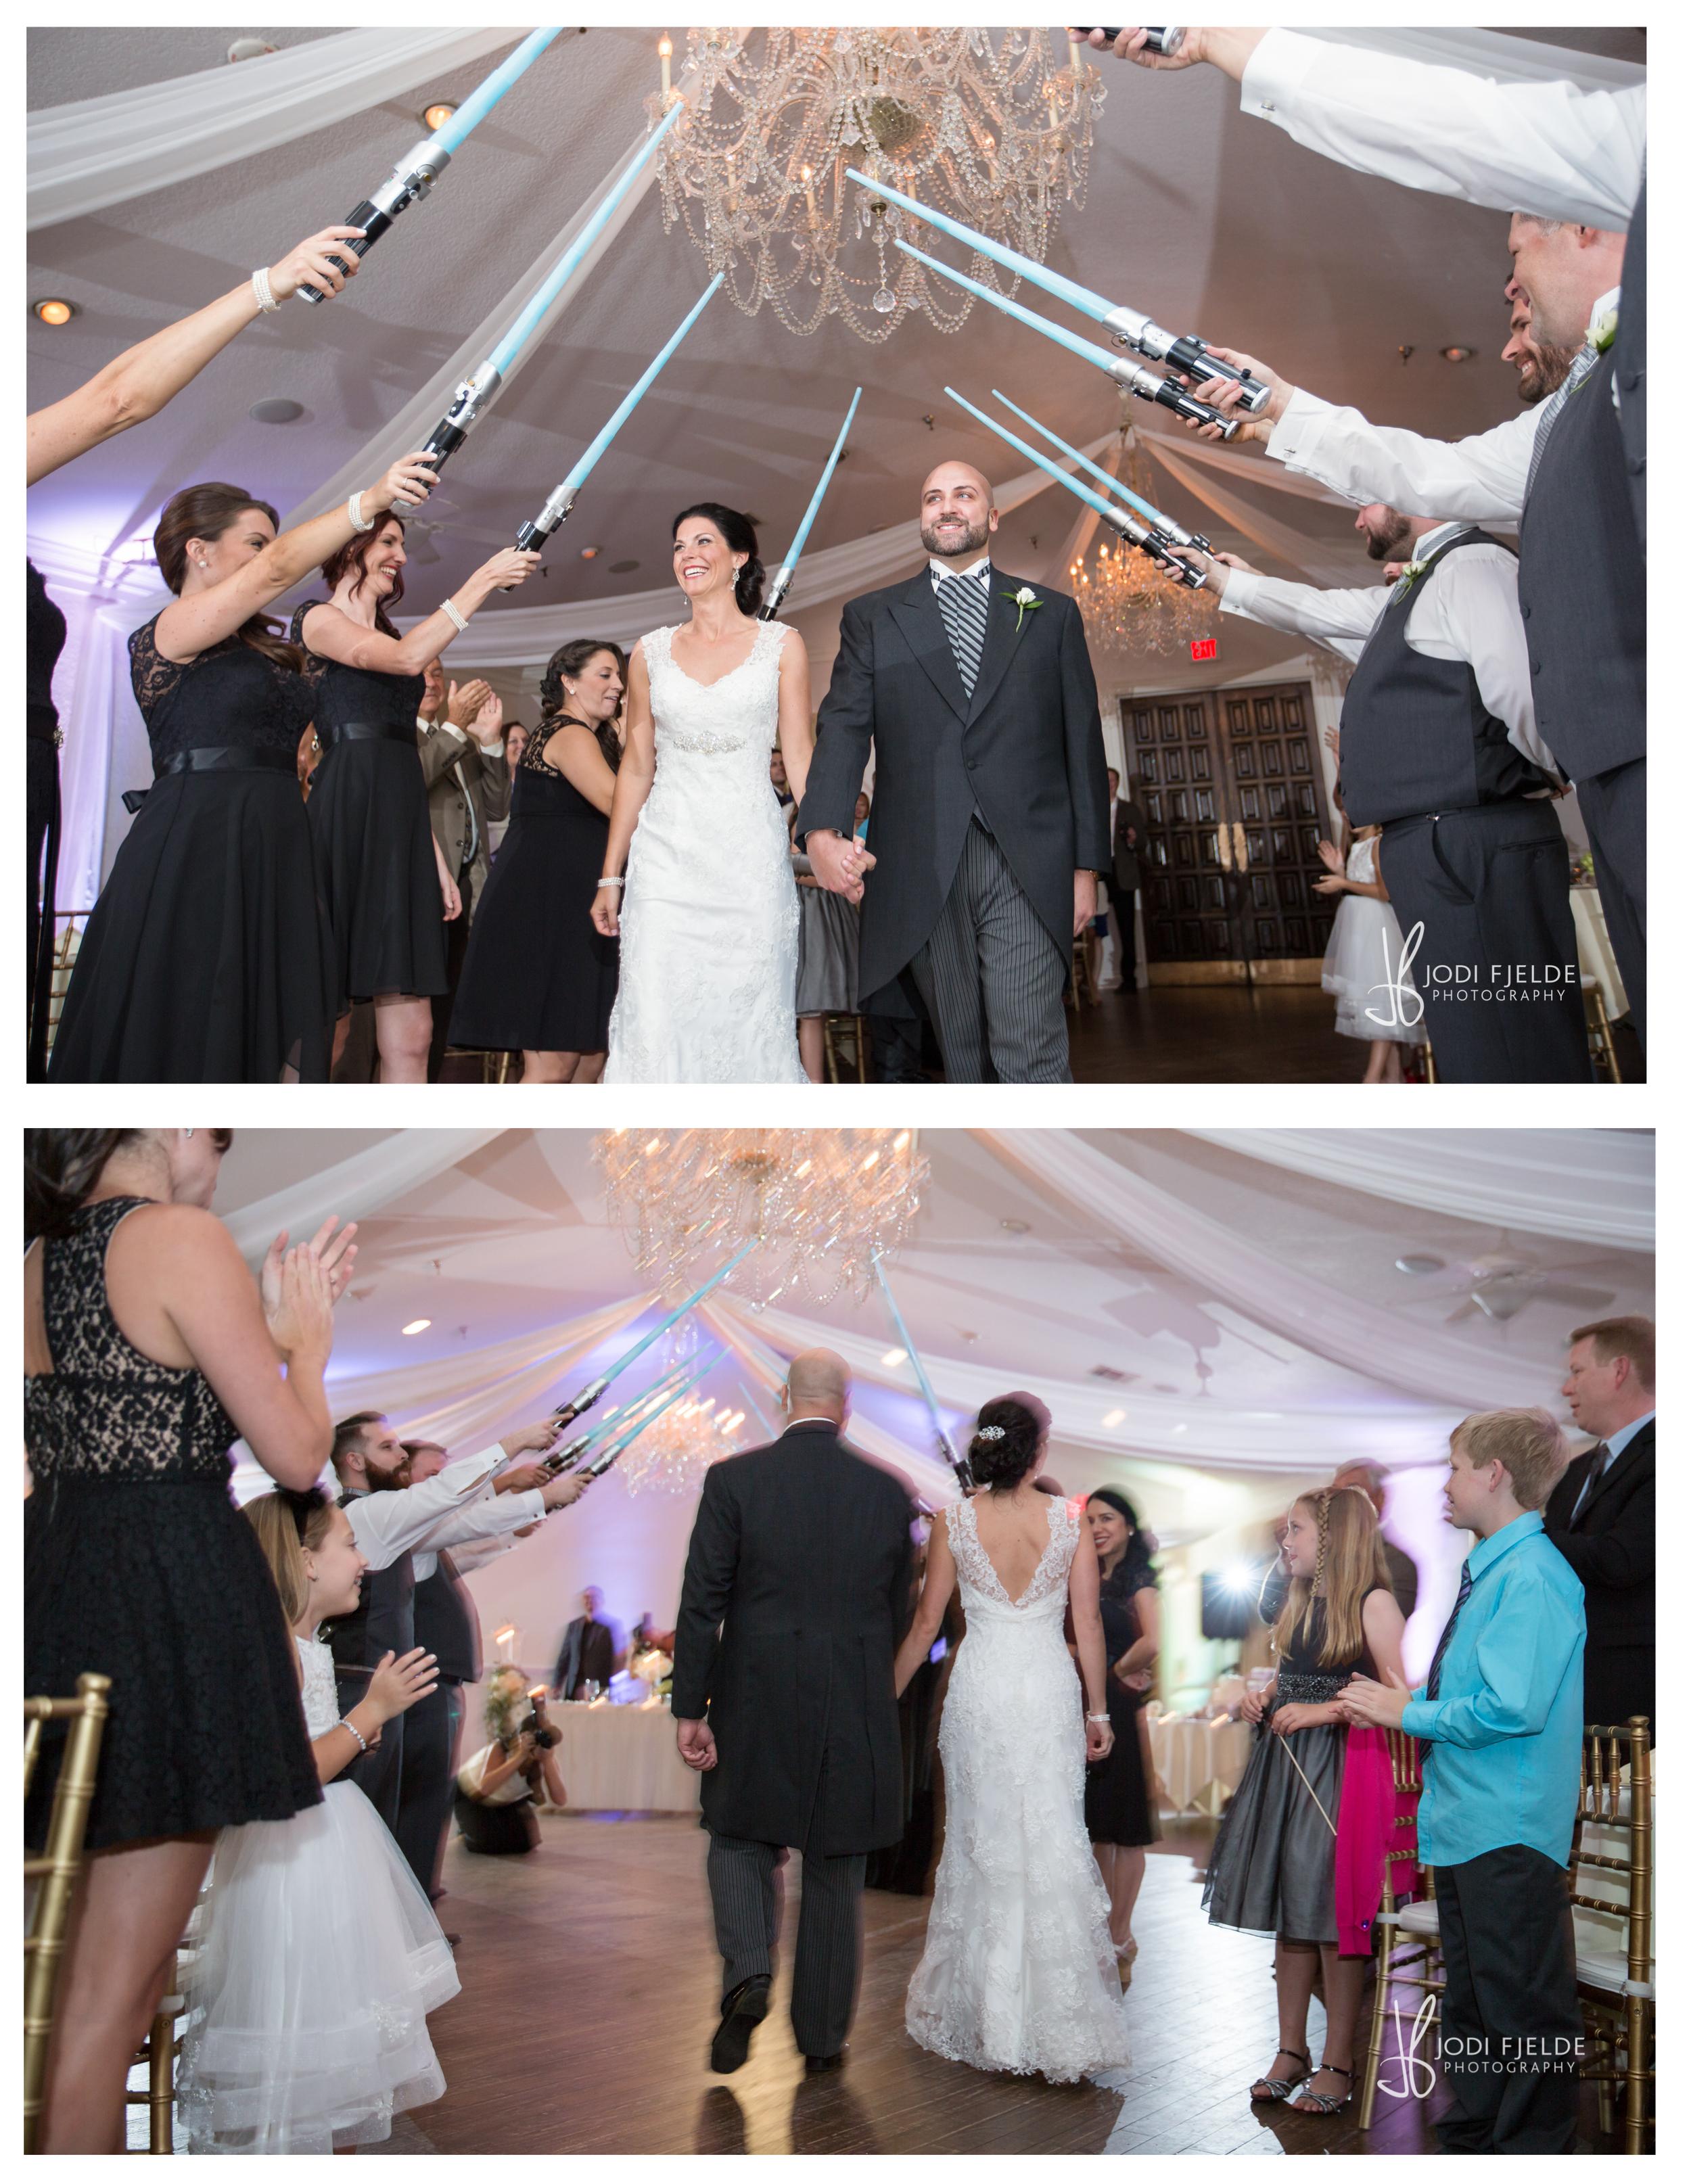 Highland_Manor_Apopka_Florida_wedding_Jackie_&_Tim_photography_jodi_Fjelde_photography-27.jpg